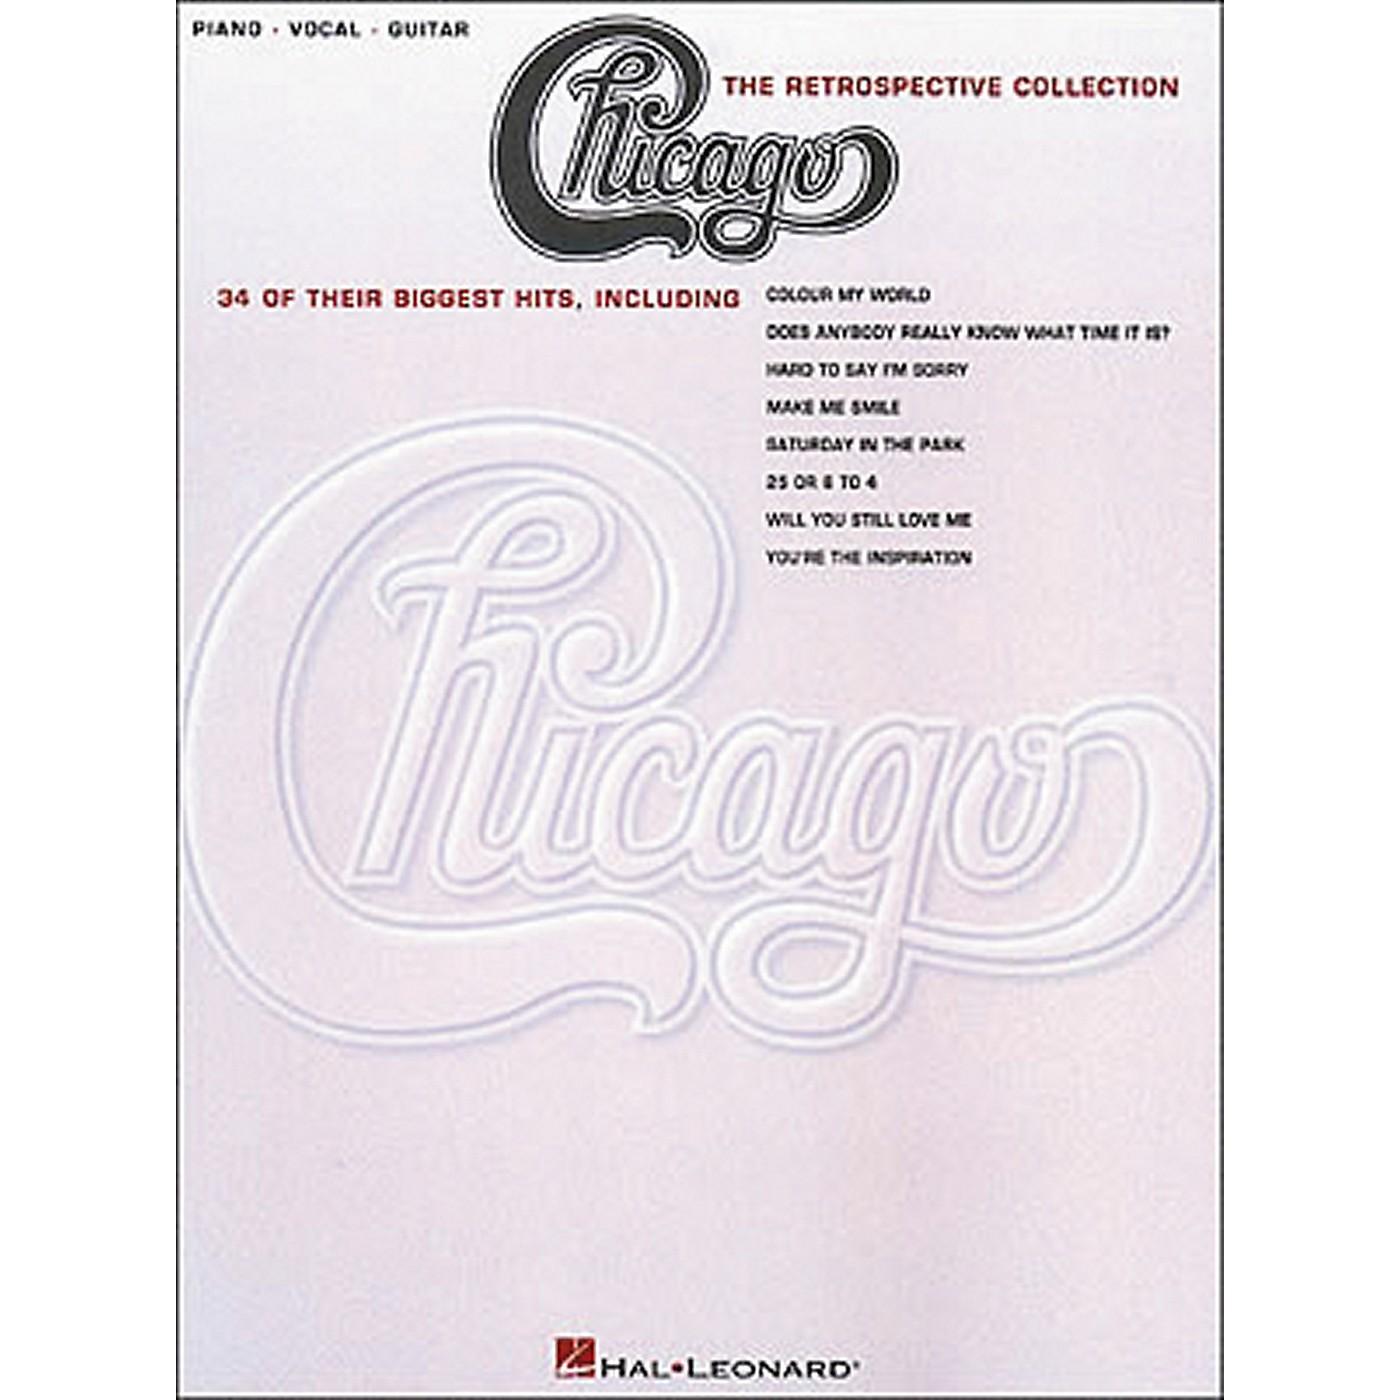 Hal Leonard Chicago the Retrospective Collection Piano, Vocal, Guitar Book thumbnail